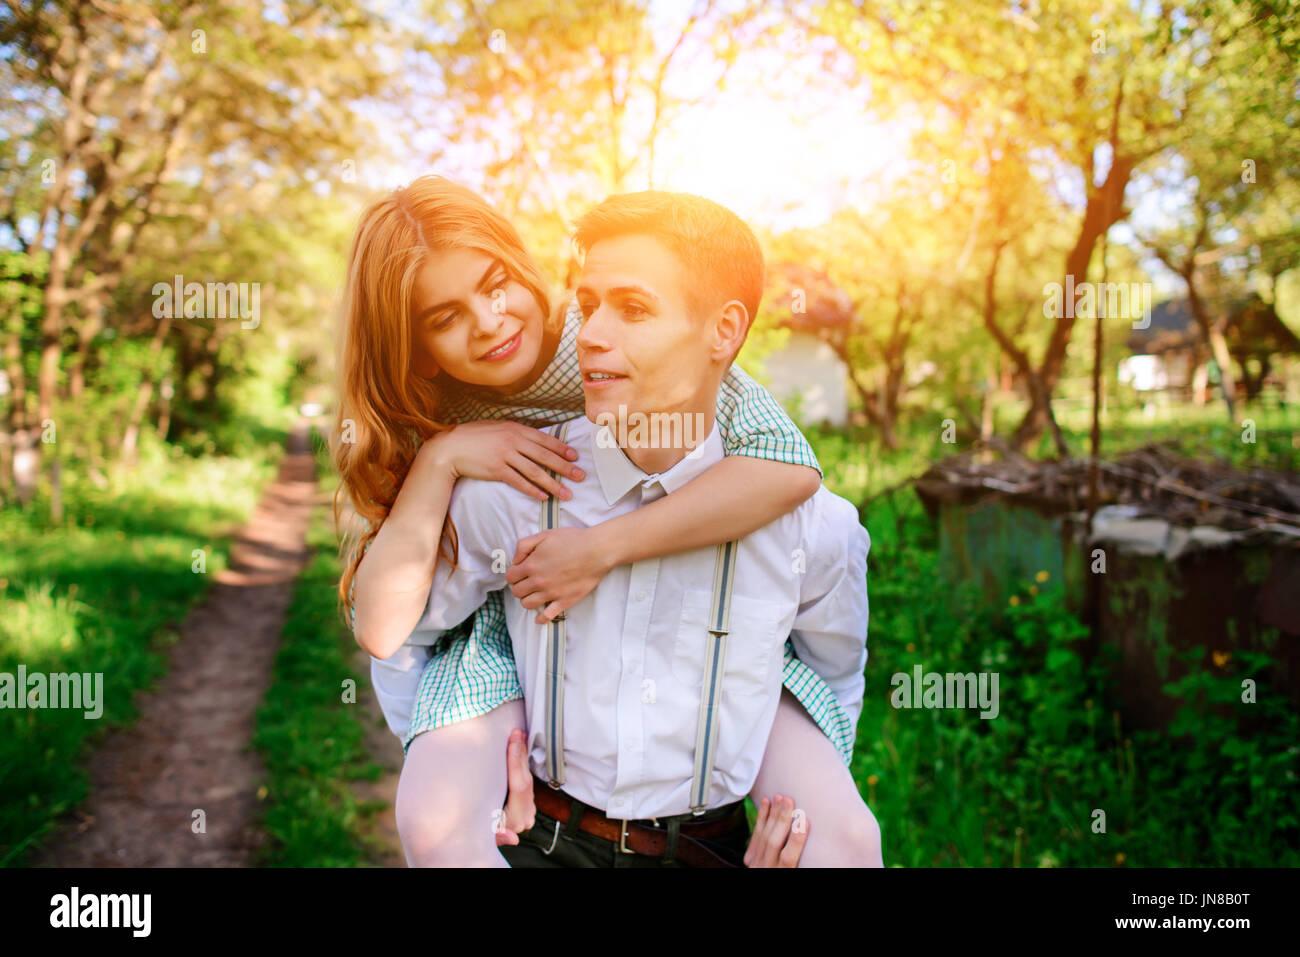 Retrato de mujer hermosa joven dando piggyback. Imagen De Stock